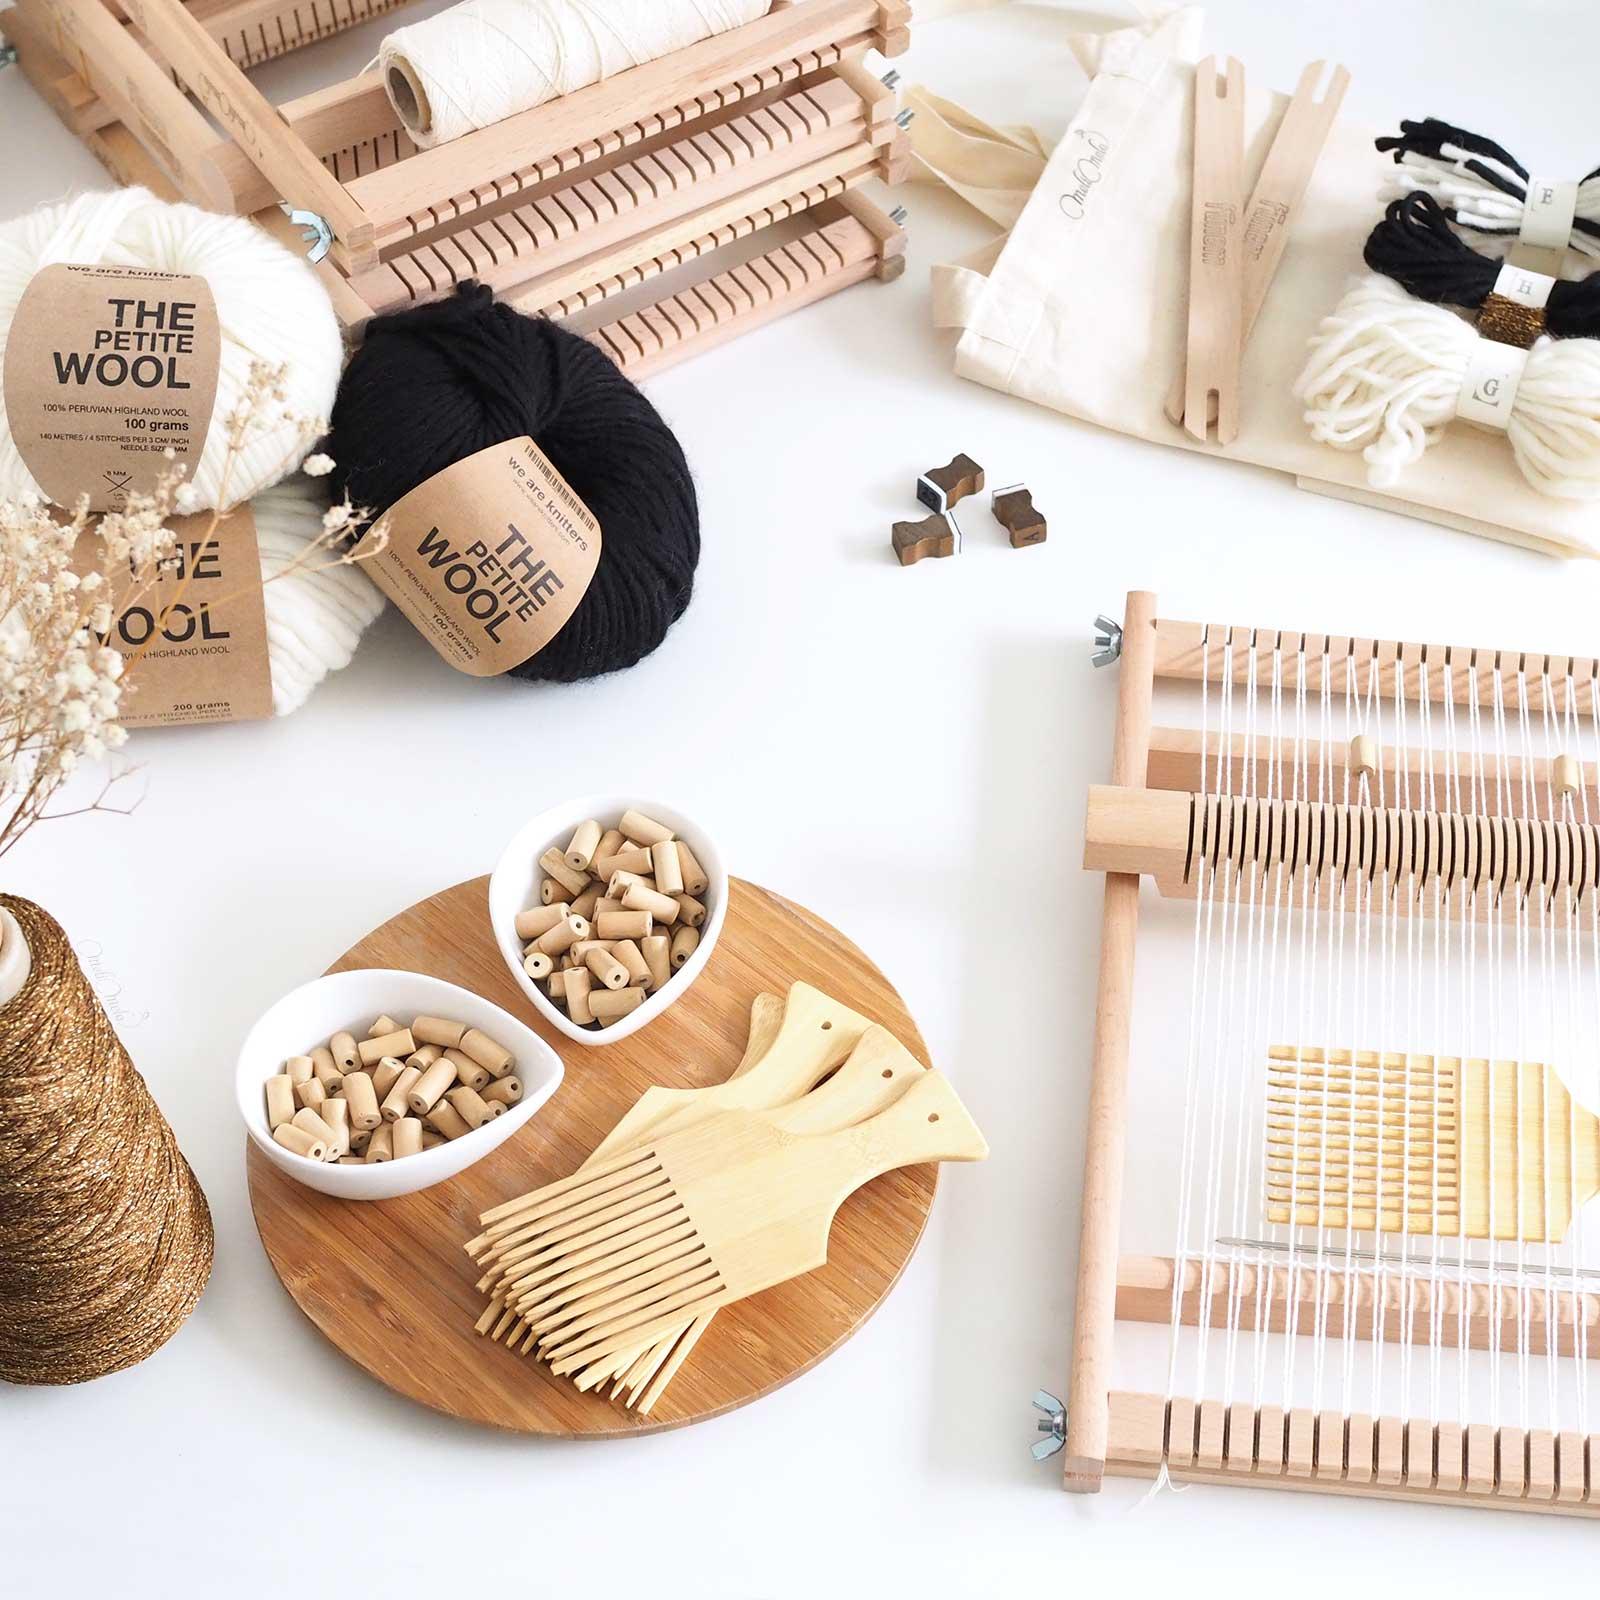 kit lana DIY telar lana destellos oro negro blanco weareknitters laboutiquedemelimelo